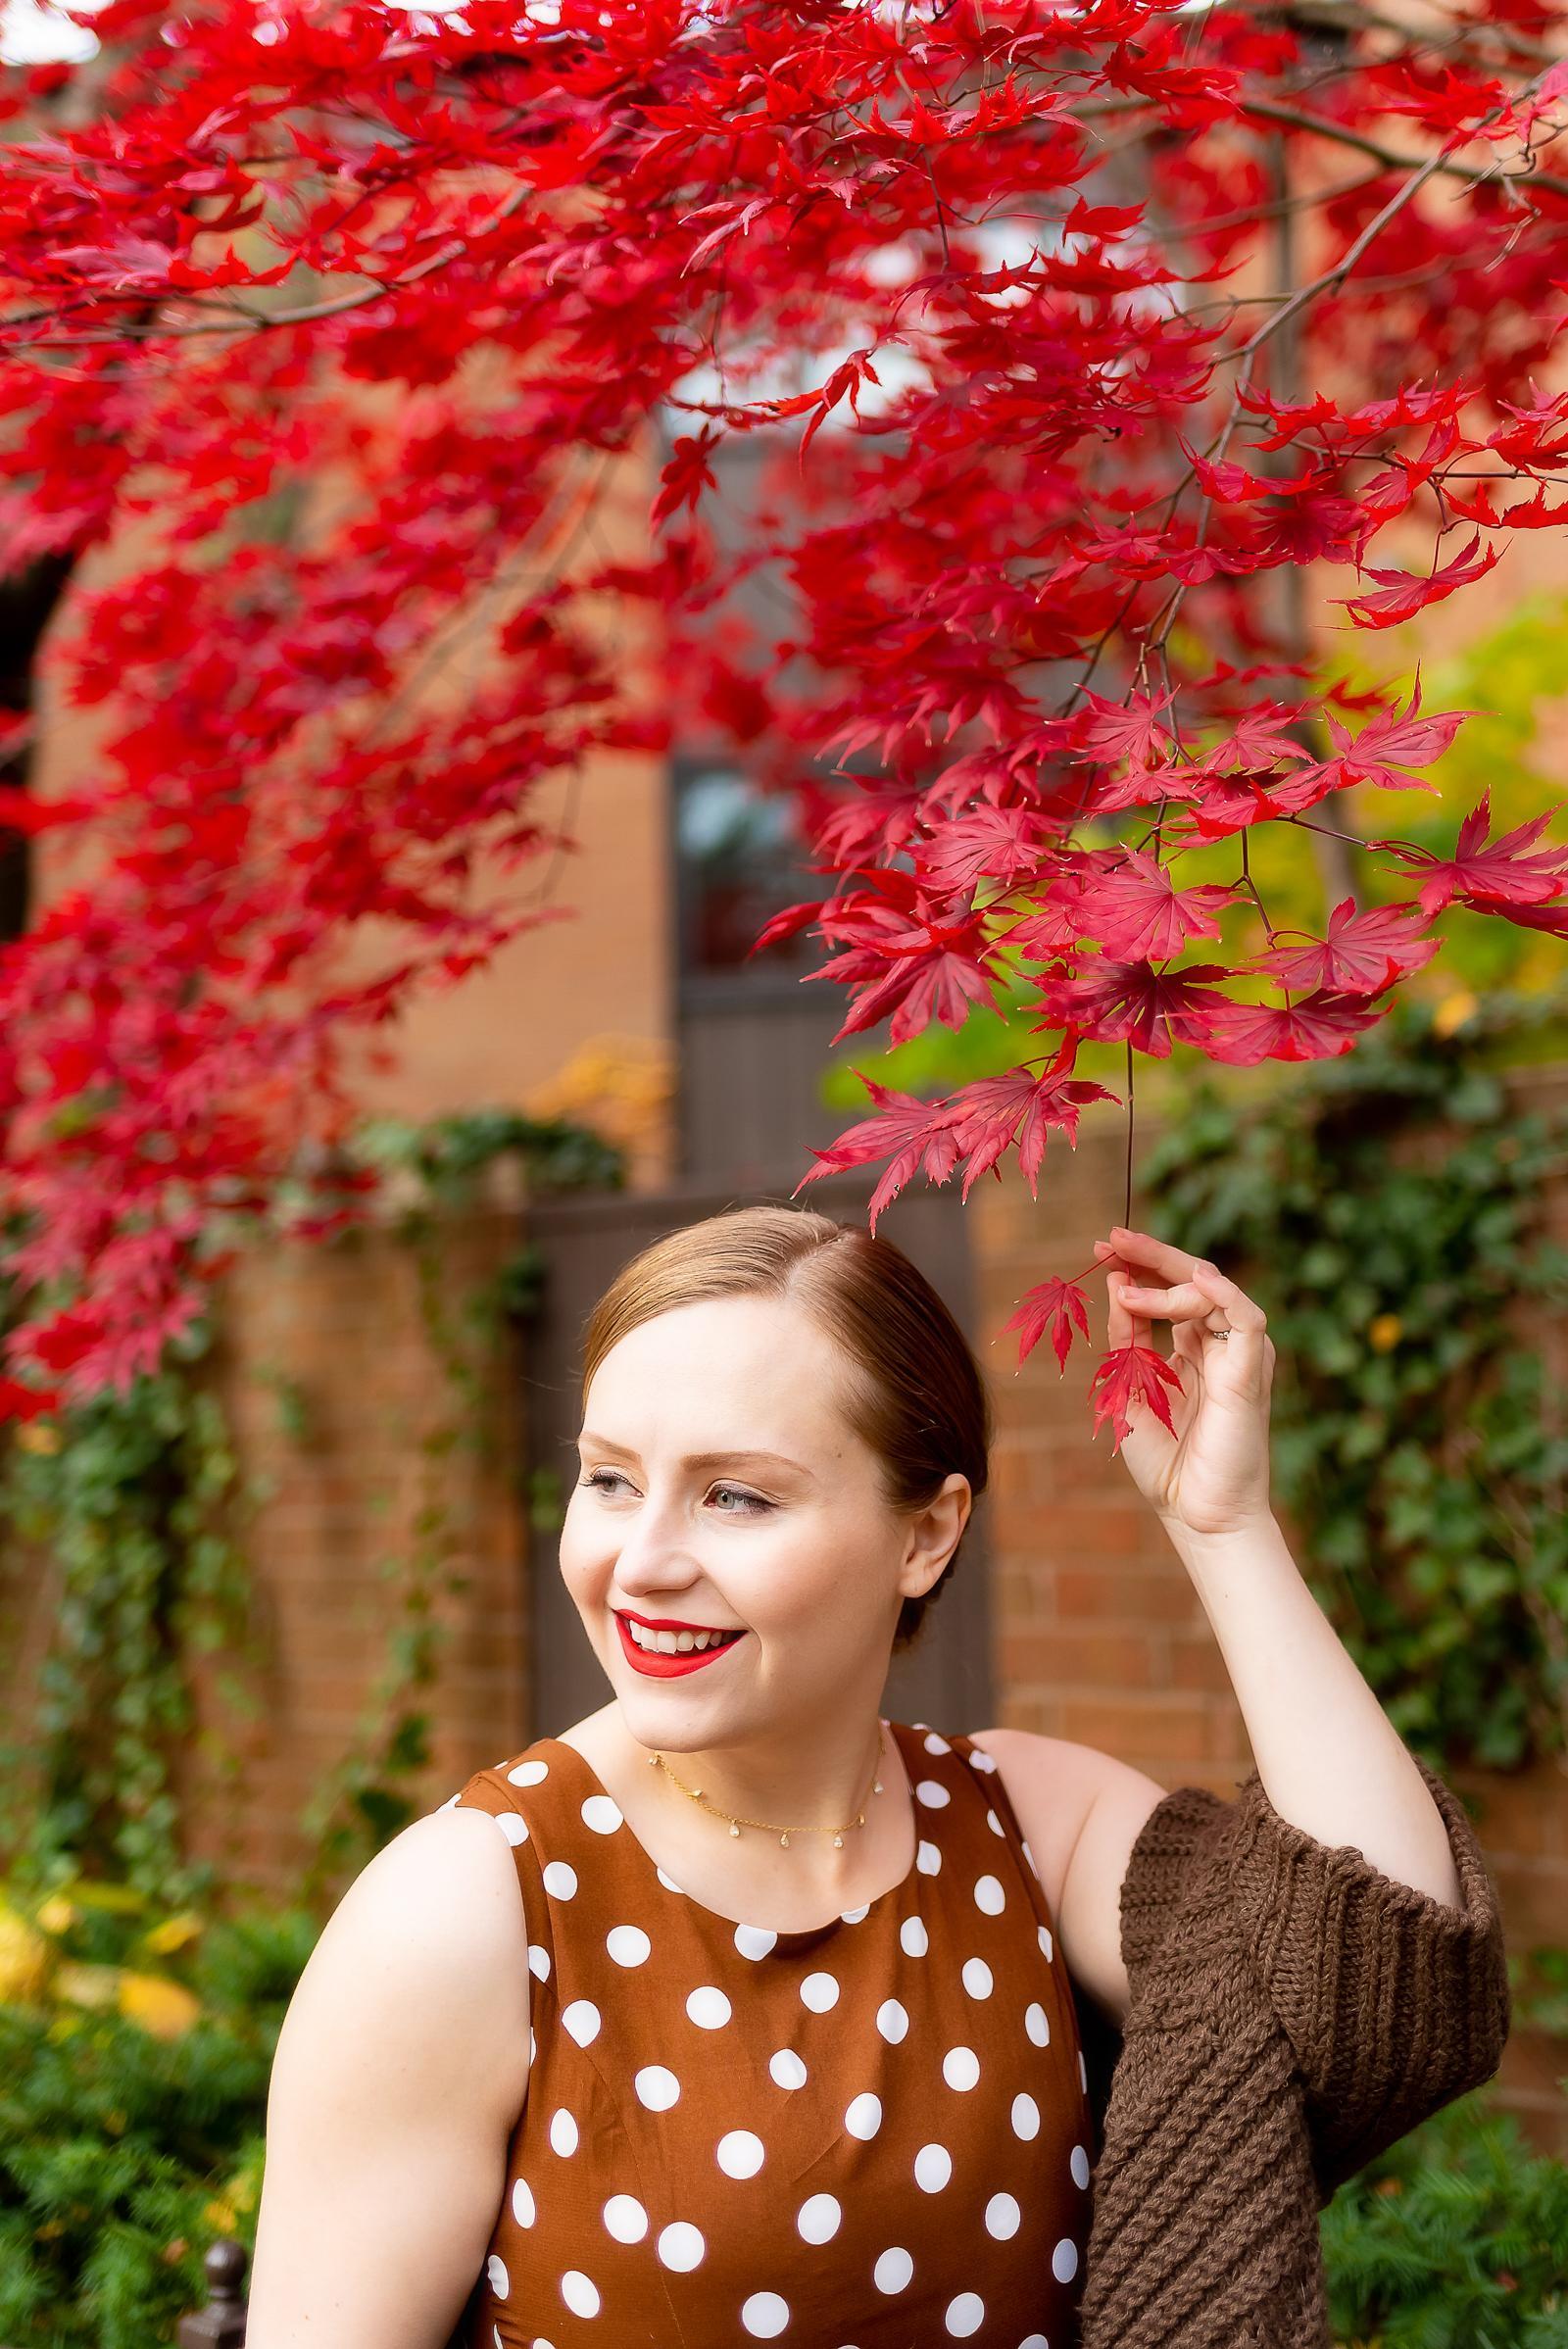 Polka Dot Thanksgiving Outfit